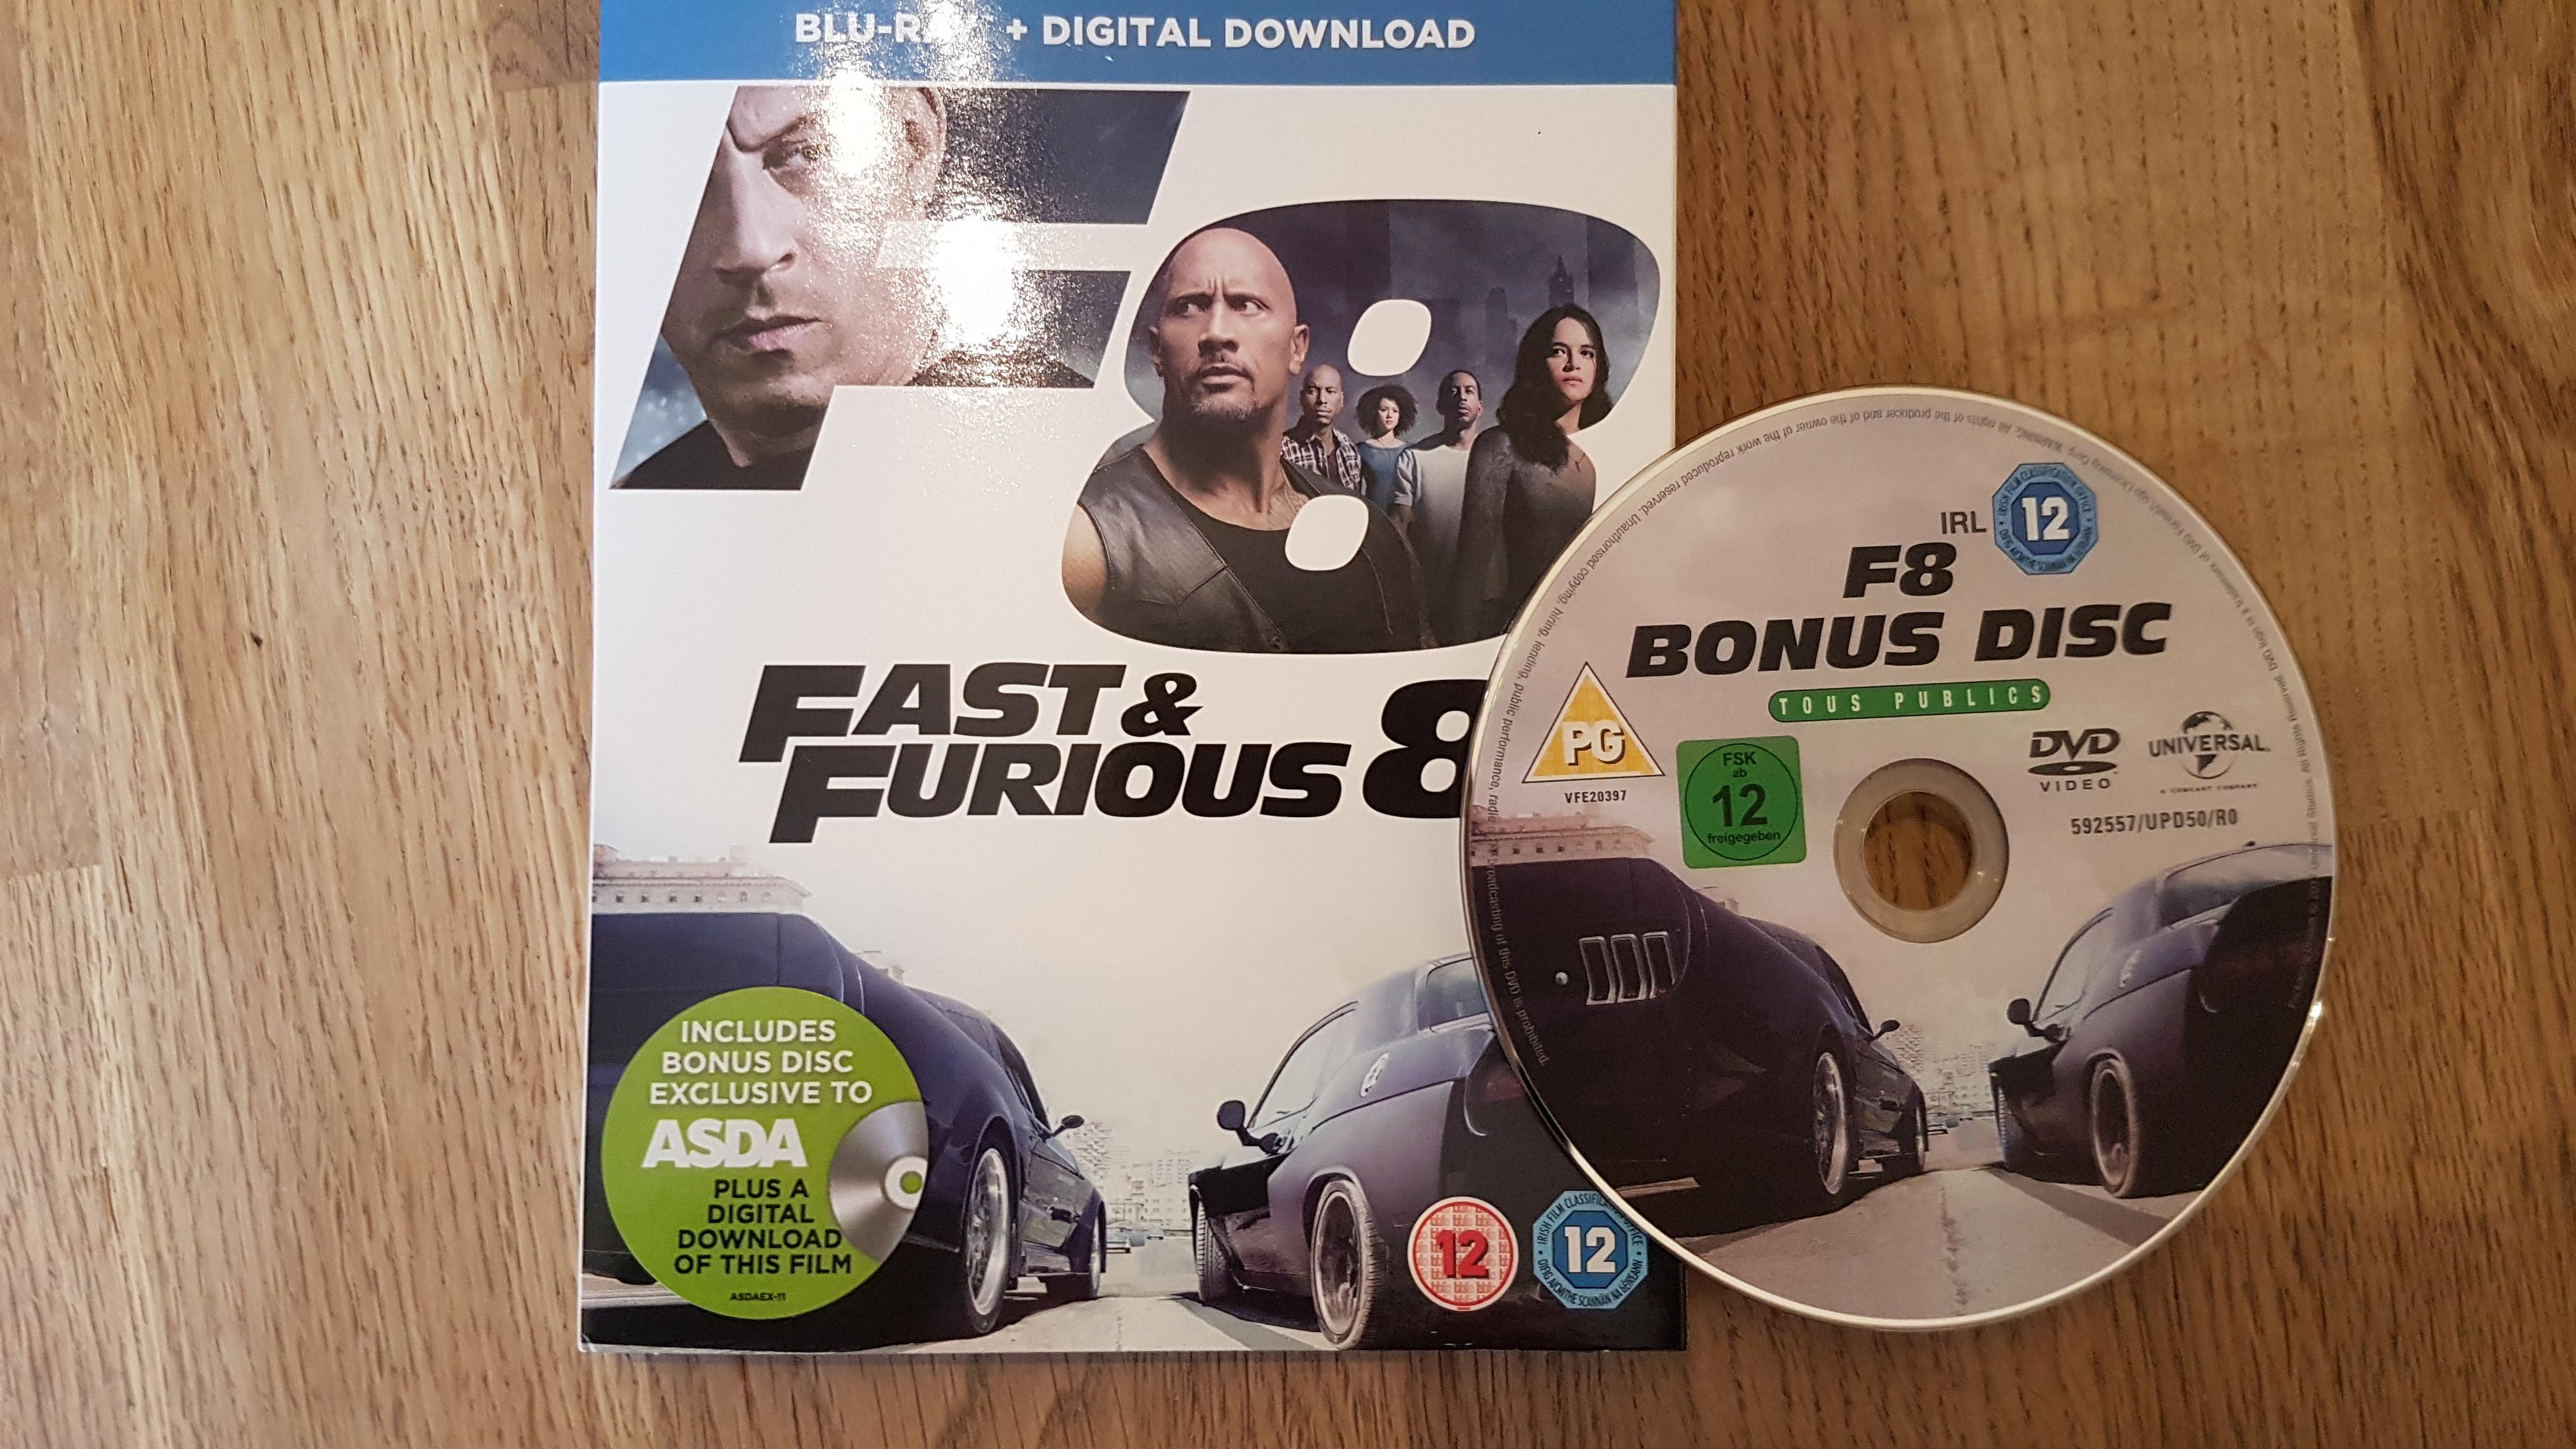 Fast and furious 8 @ Asda instore with bonus disc. £15